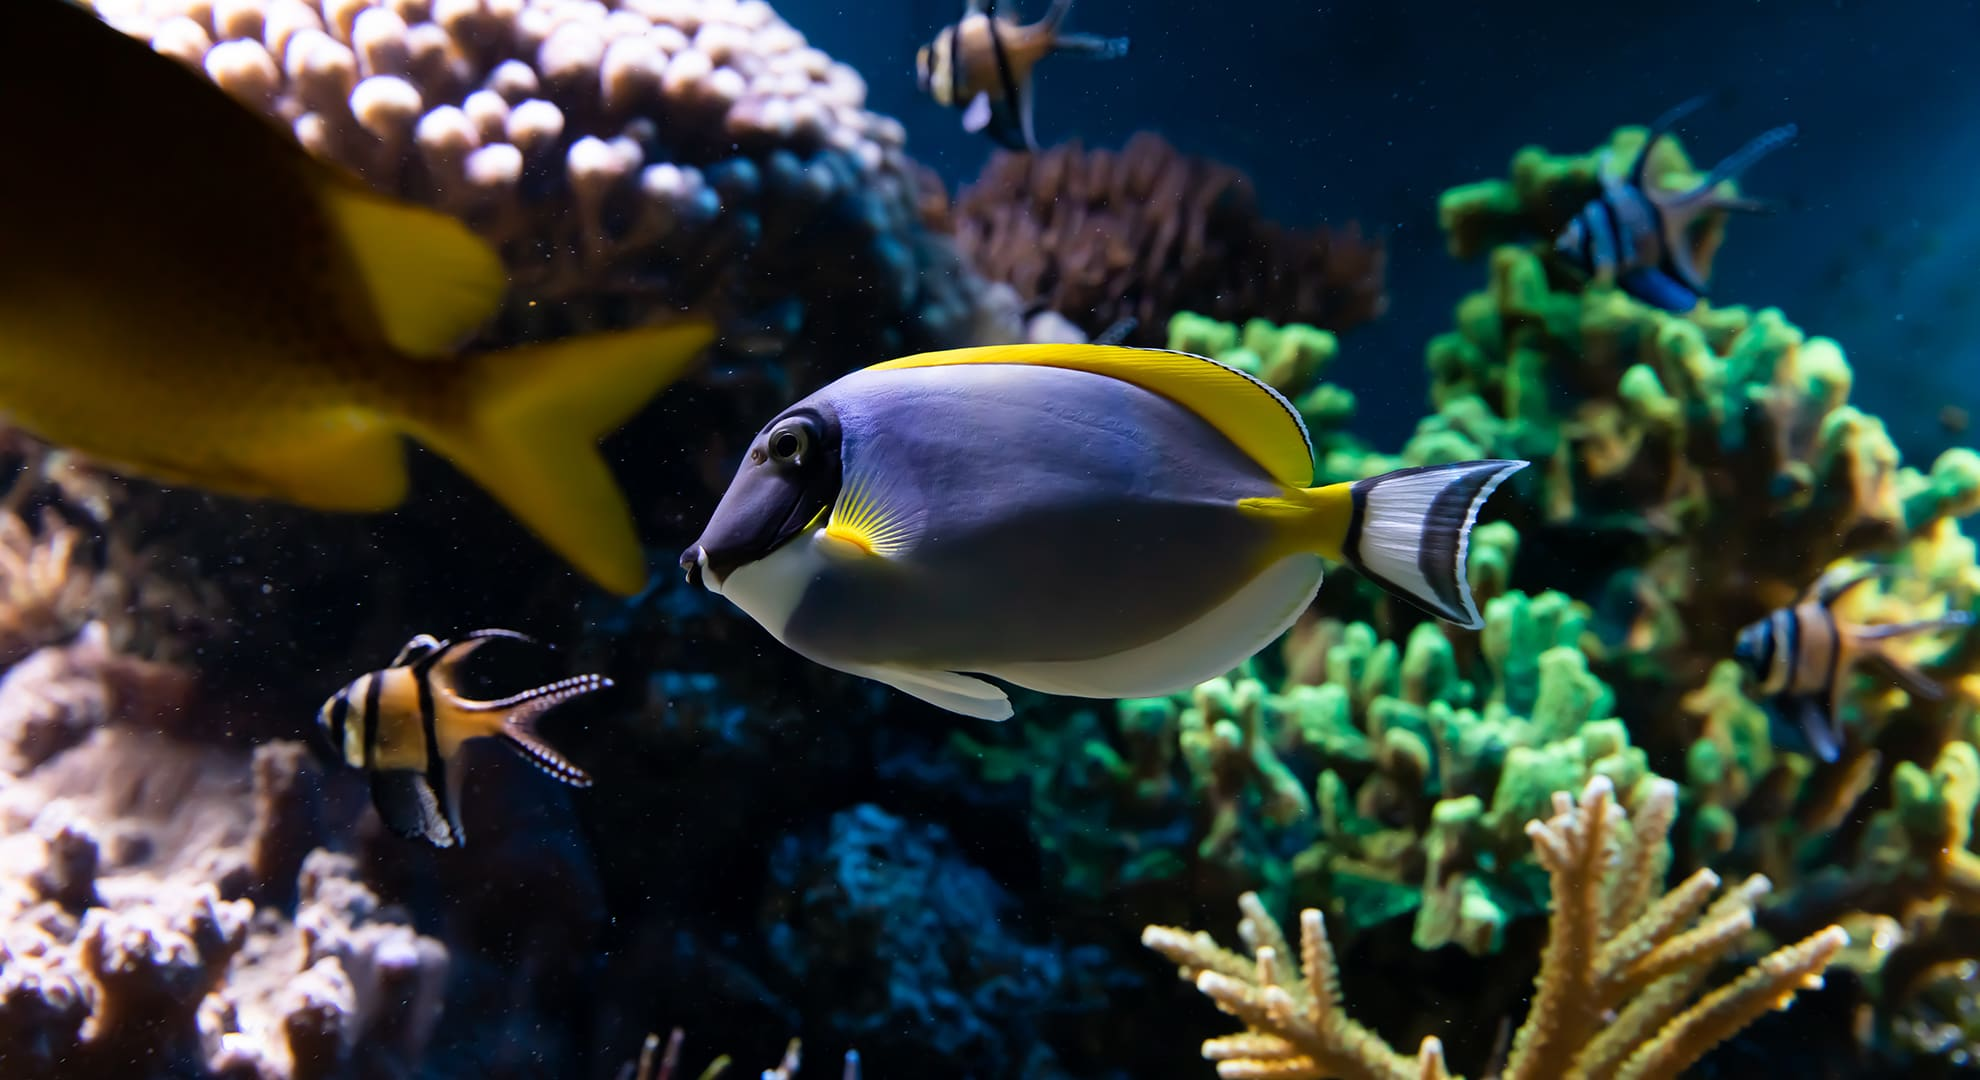 Cayman Island Luxury diving